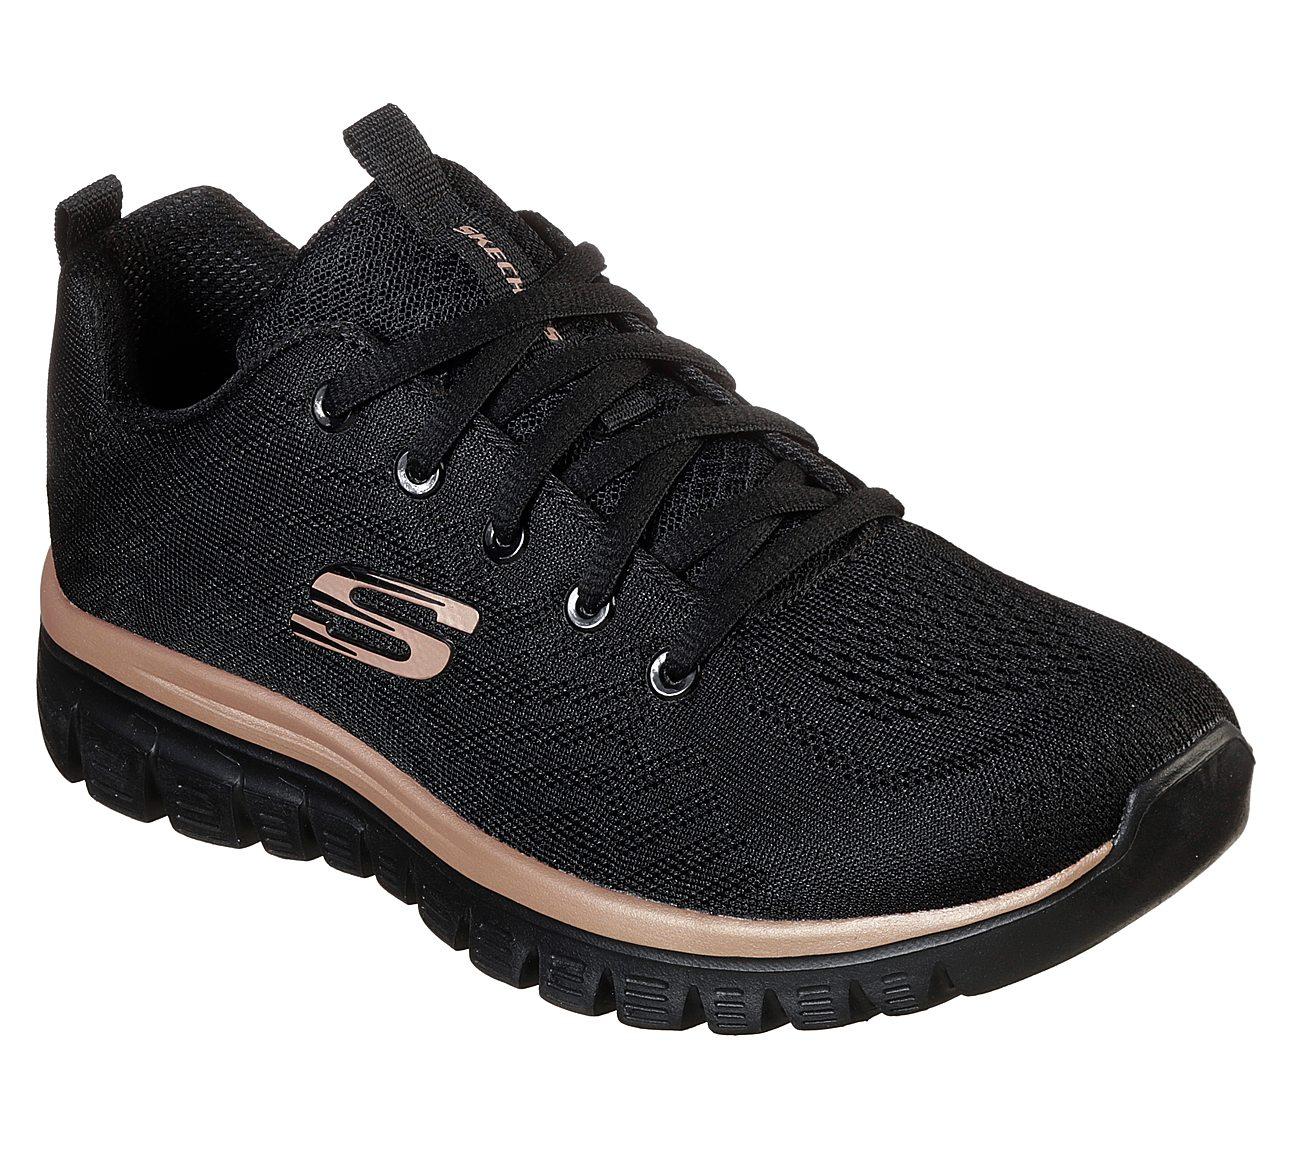 Caso Personificación Perla  Buy SKECHERS Graceful - Get Connected SKECHERS Sport Shoes